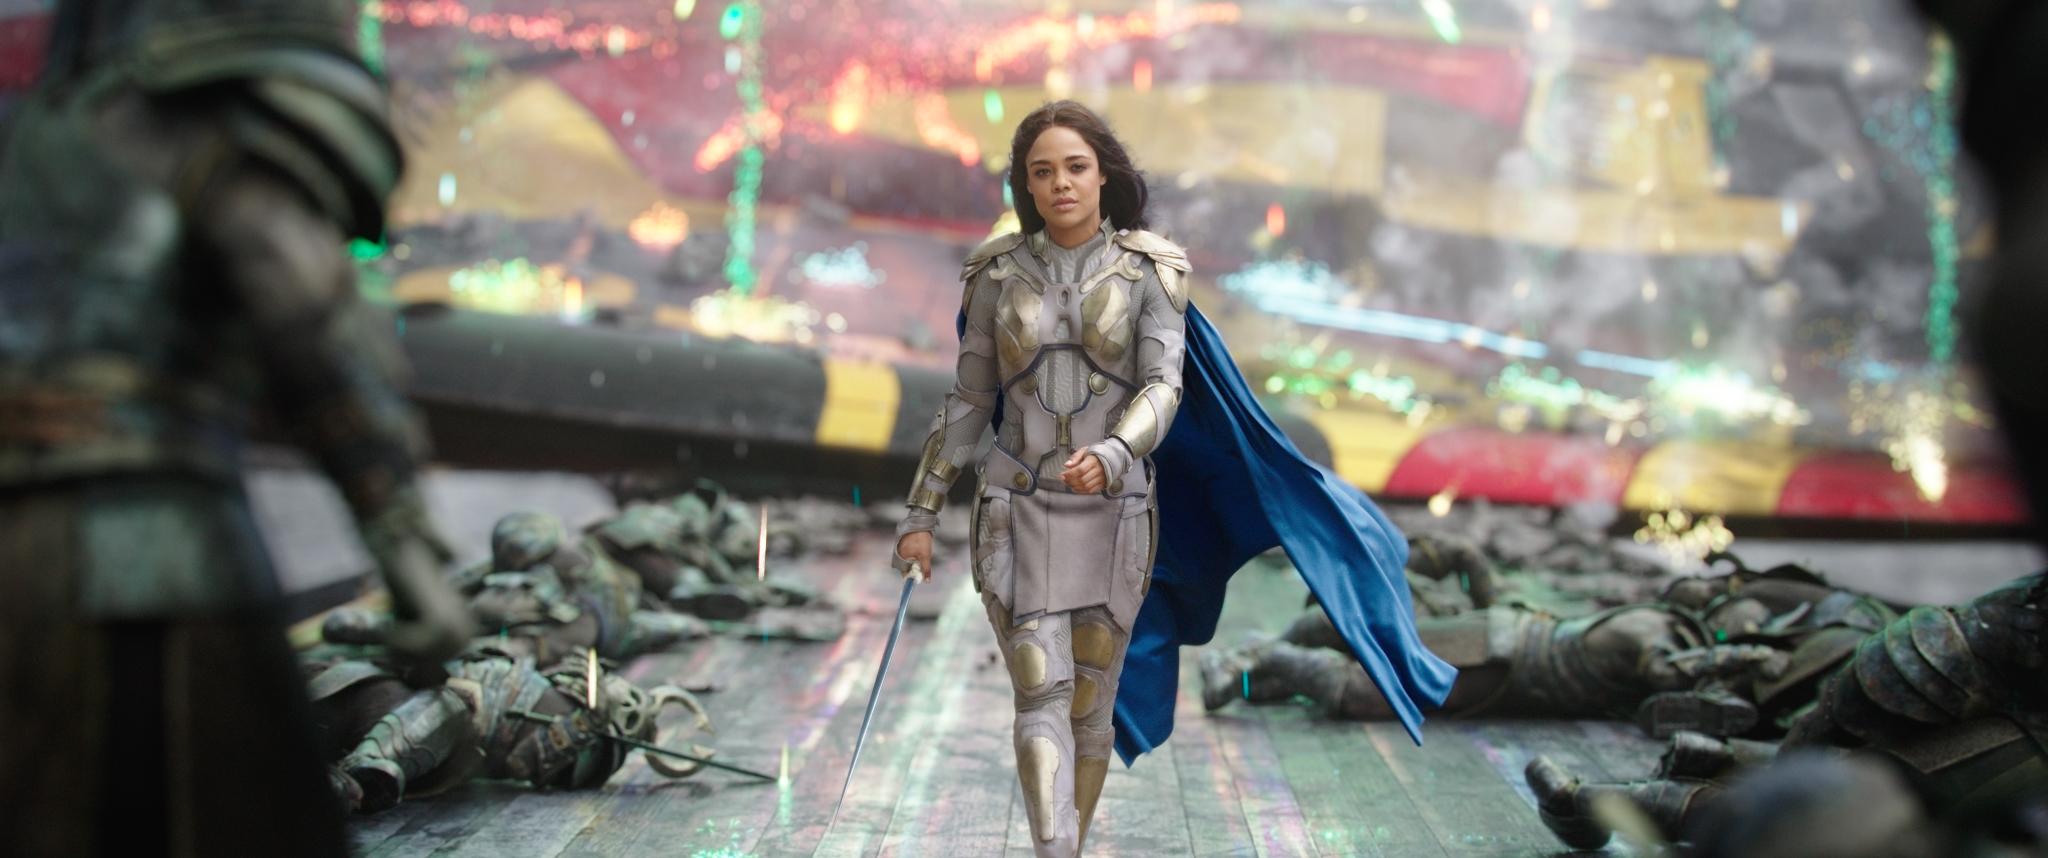 Marvel's Phase 4 Will Actively Embrace Diversity, Tessa Thompson Says